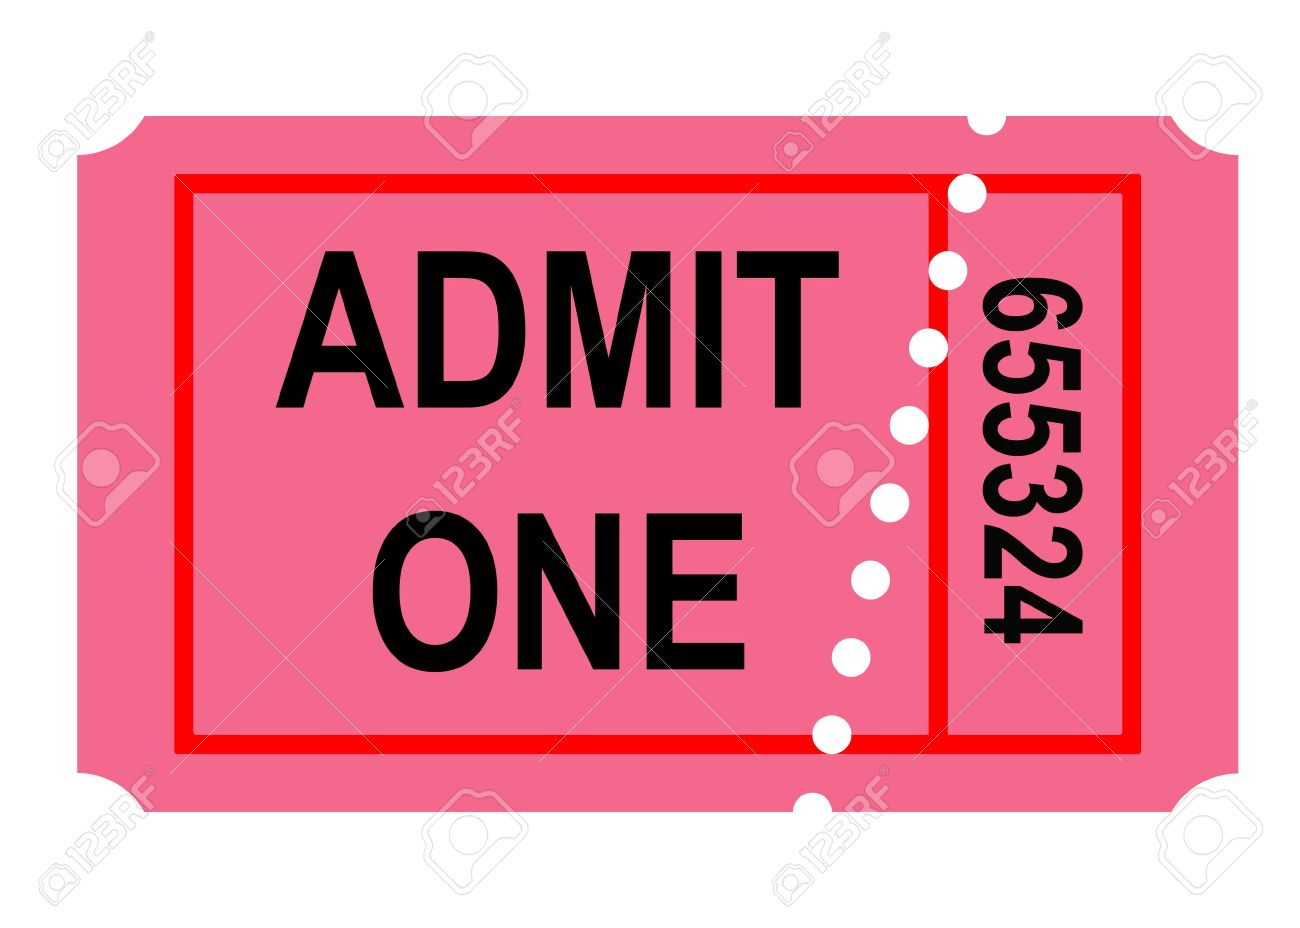 illustration illustration of admit one perforated ticket isolated on white background